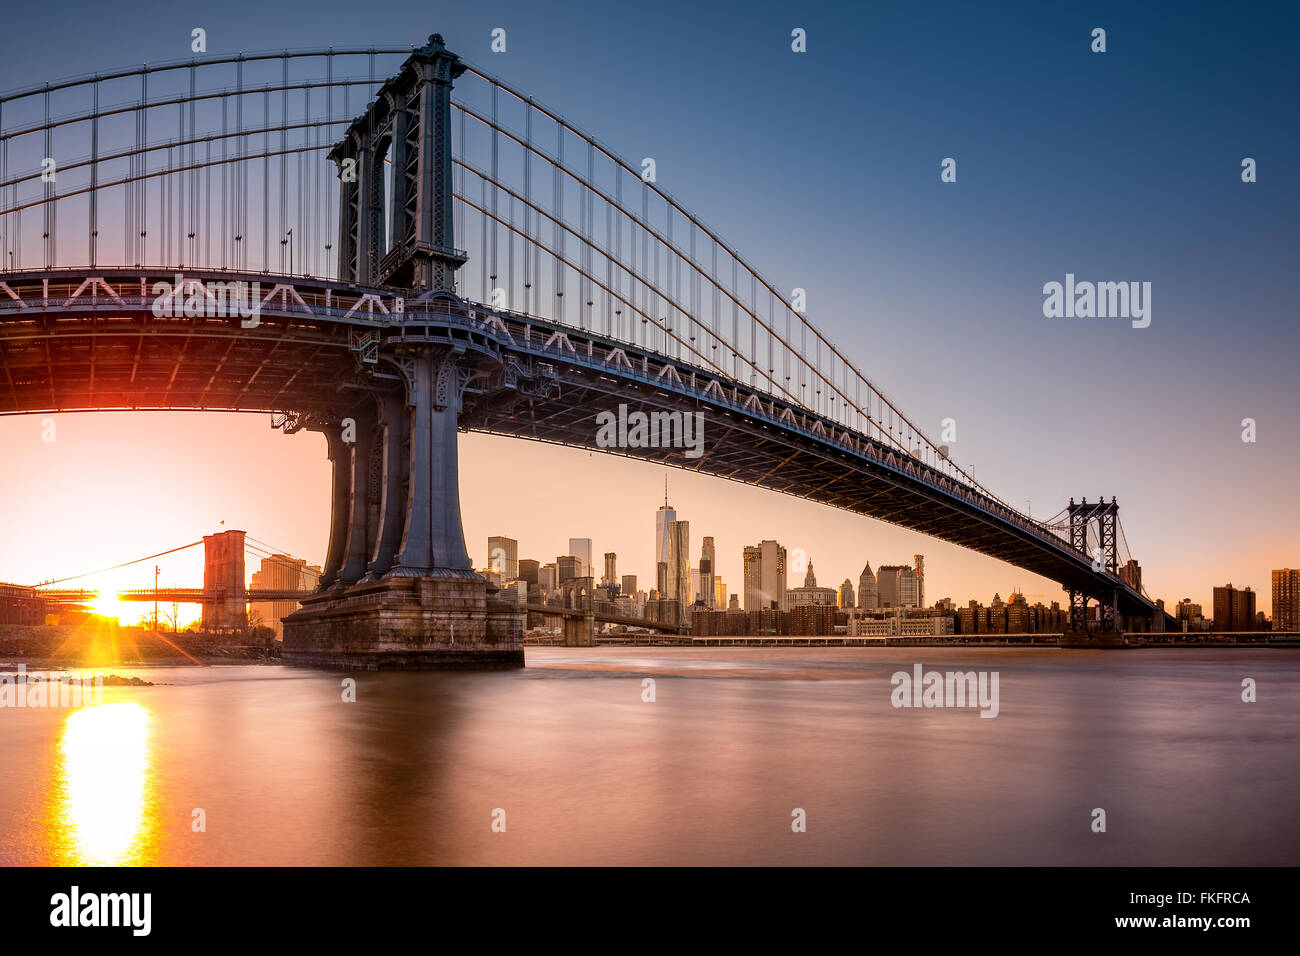 Manhattan Bridge framing rascacielos de Nueva York al atardecer. Imagen De Stock